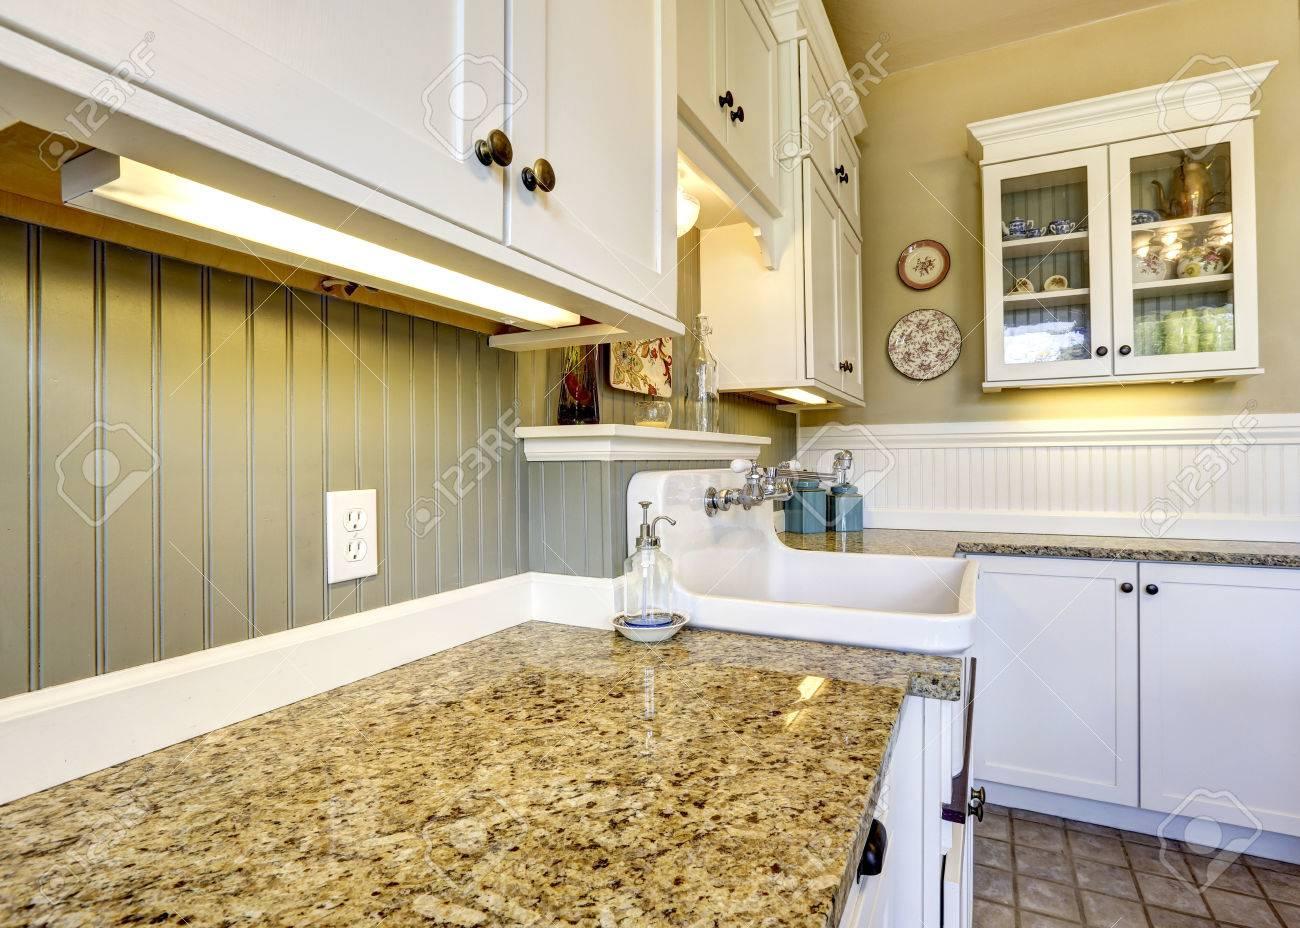 kitchen paneling backsplash